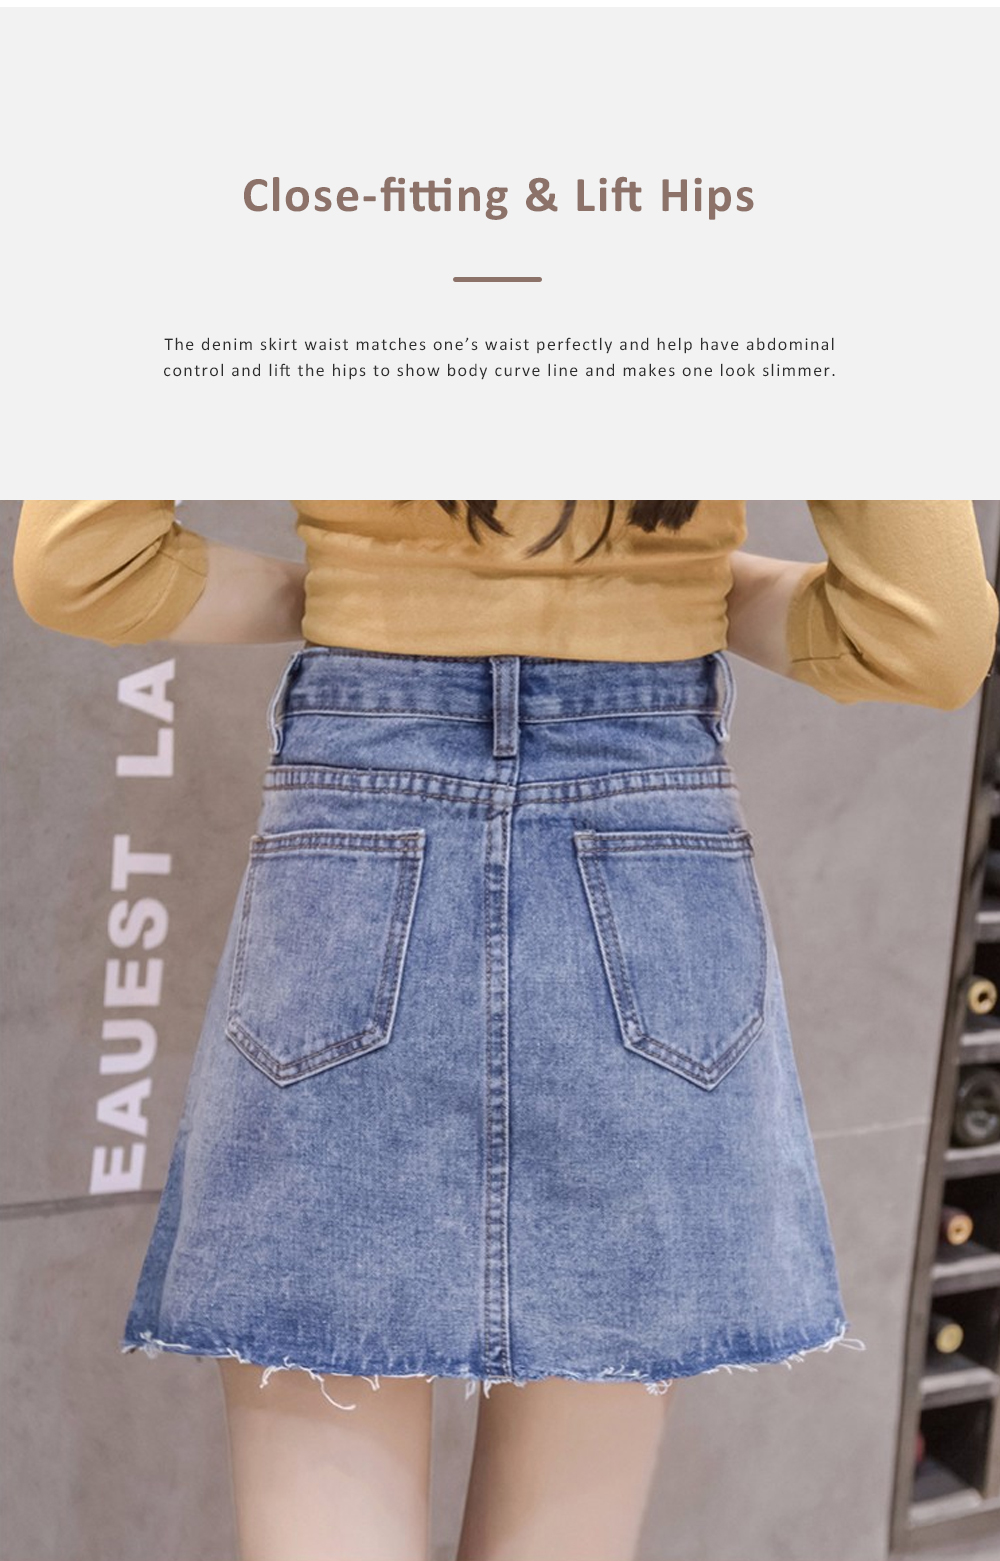 Close-fitting Irregular Denim Skirt for Women in Summer High-waisted Slimmer-looking Sheath Dress Hairy Brim Jean Midskirt Women Dress 4